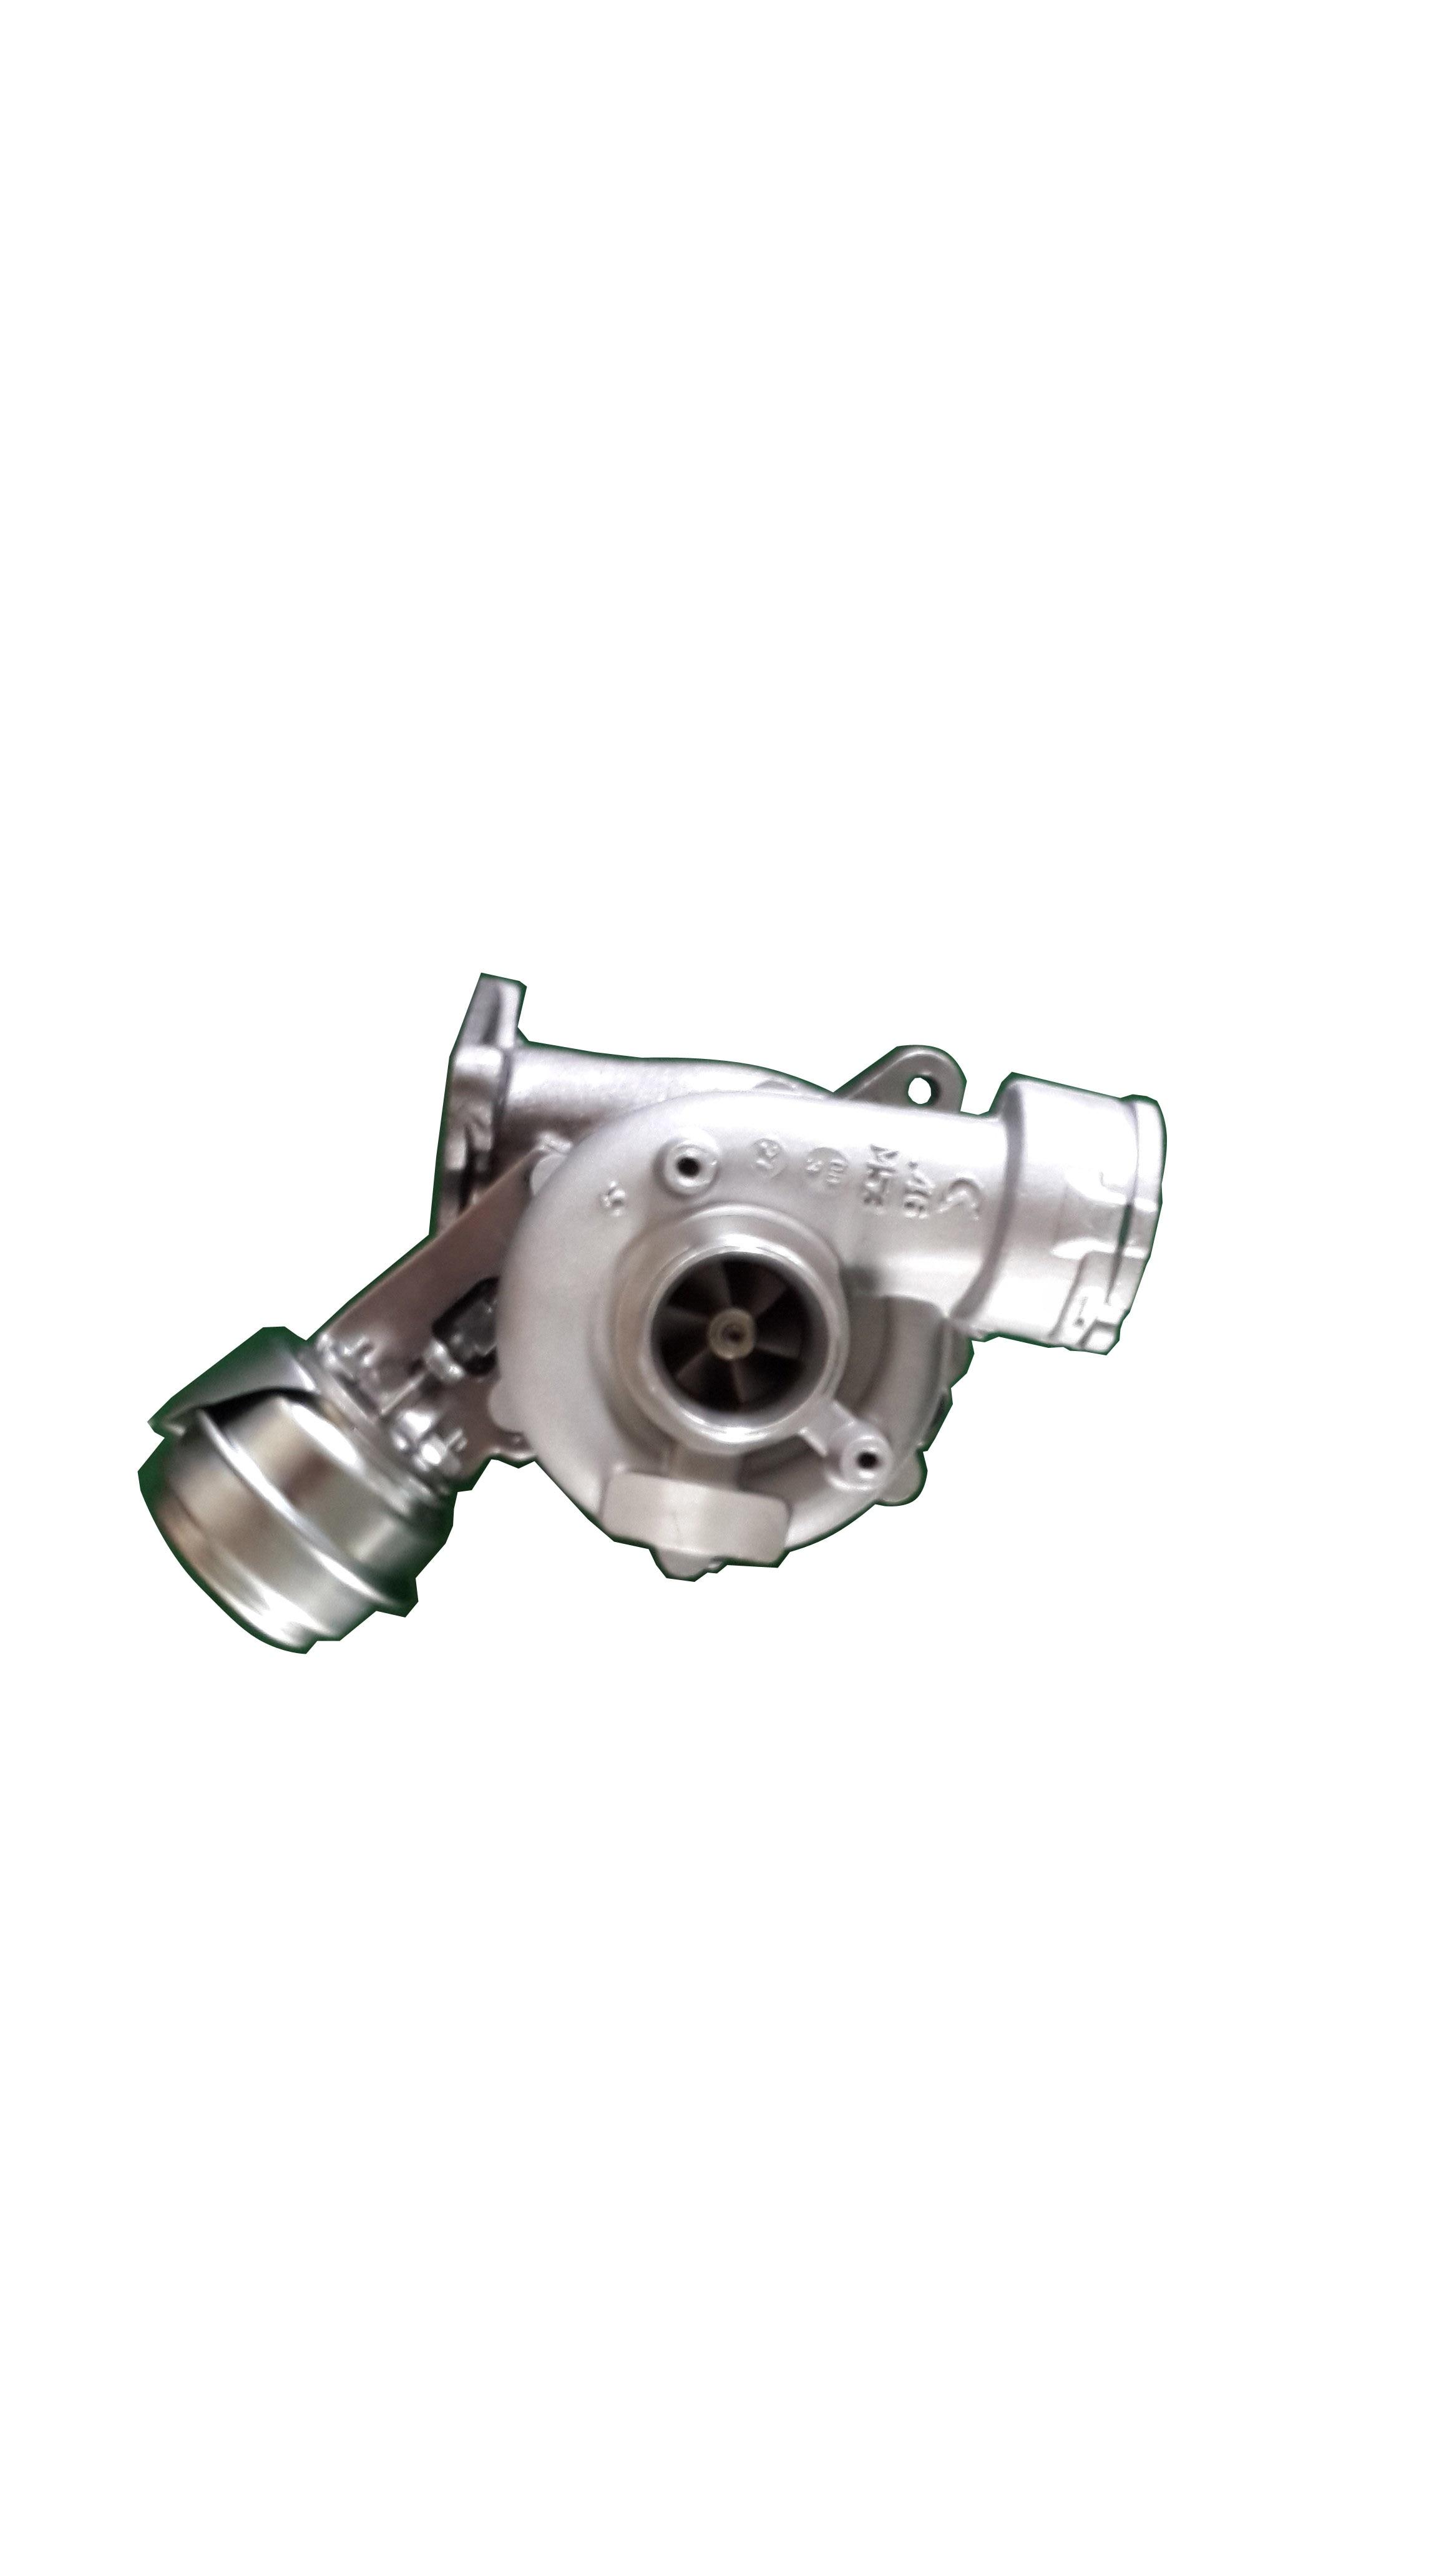 GT1749V TURBO 717858-5009 S/712077-0001/038145702E/038145702EV110/038145702G/038145702GV105/ por FAV/AWX/BLB/BPW motor 130HP